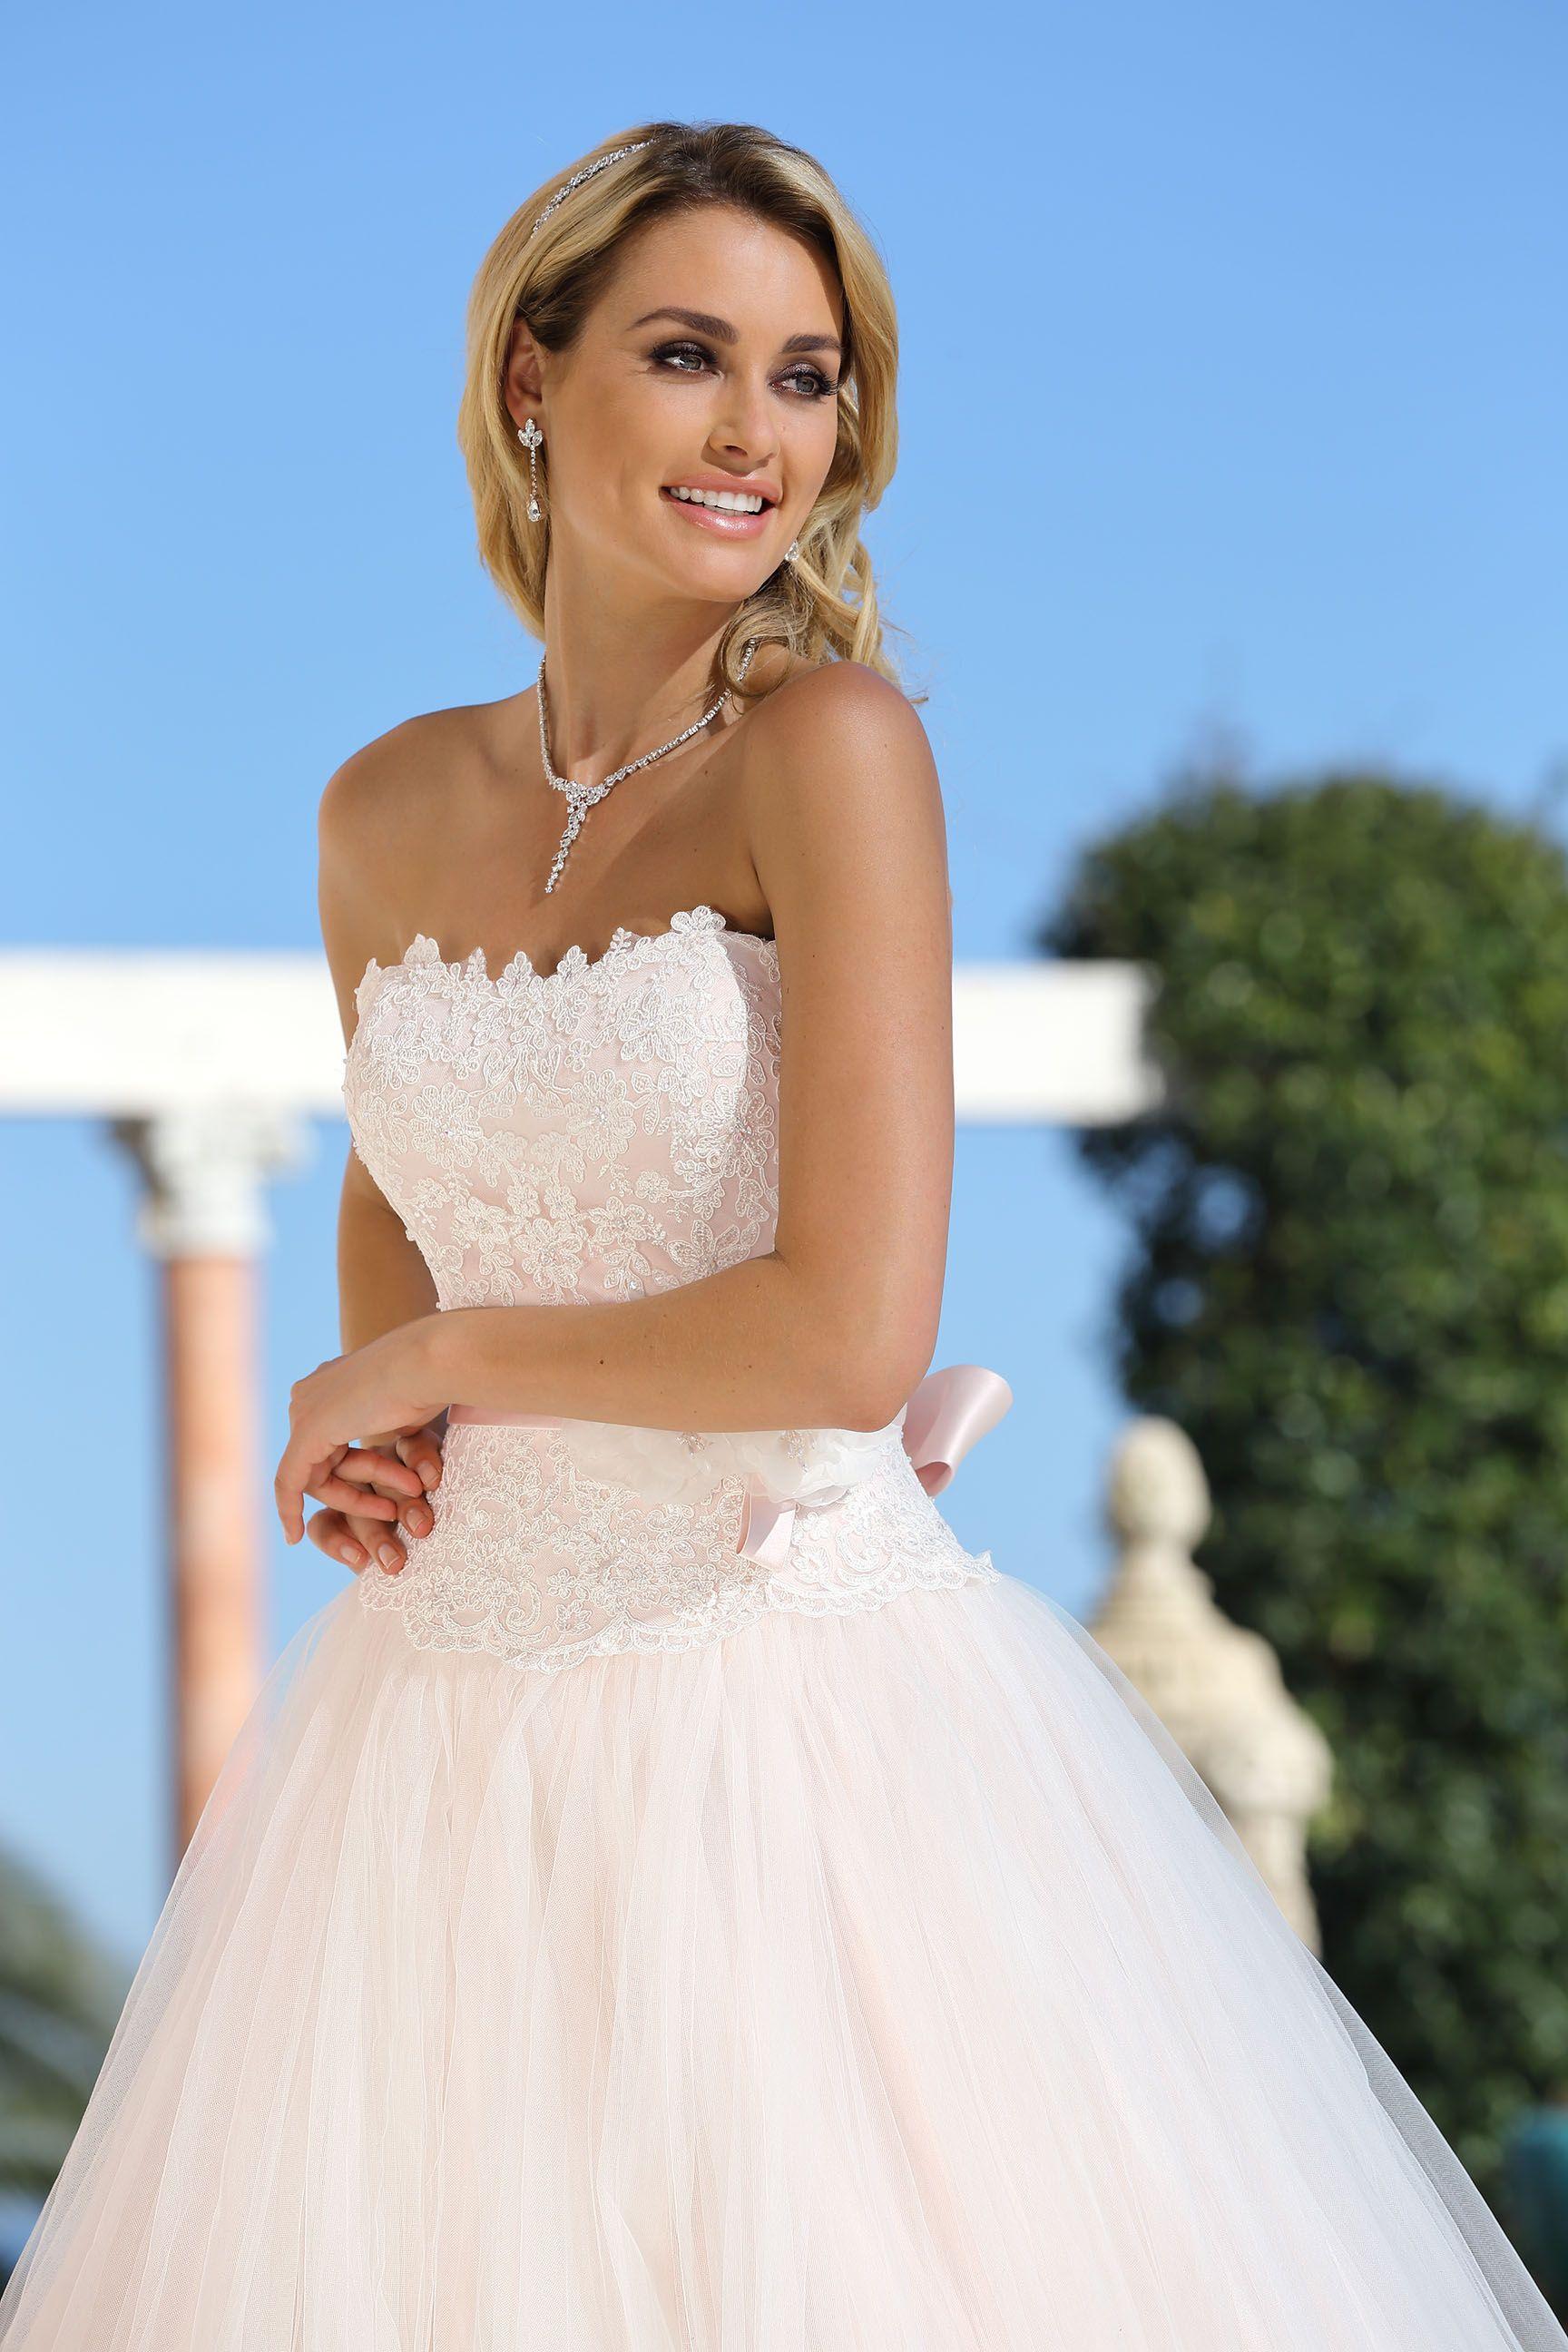 Ladybird Wedding Dress 416027 | Brautkleid | Pinterest | Brautkleid ...